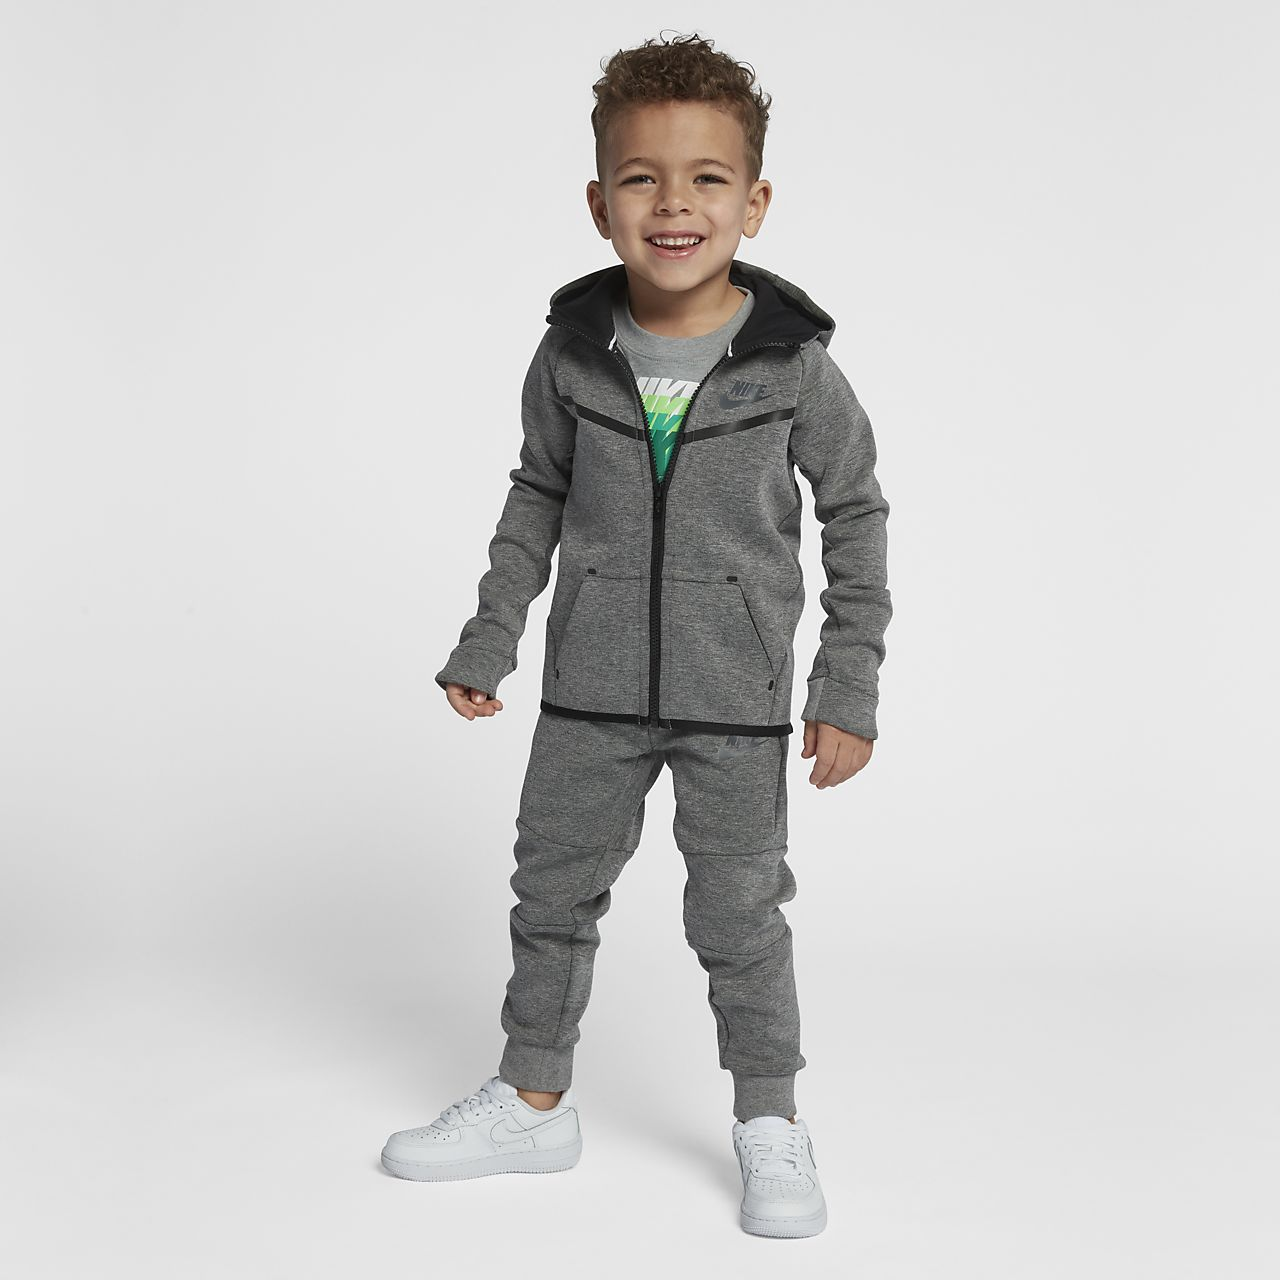 d2c849a3f326 Nike Tech Fleece Conjunt de dues peces - Infant. Nike.com ES